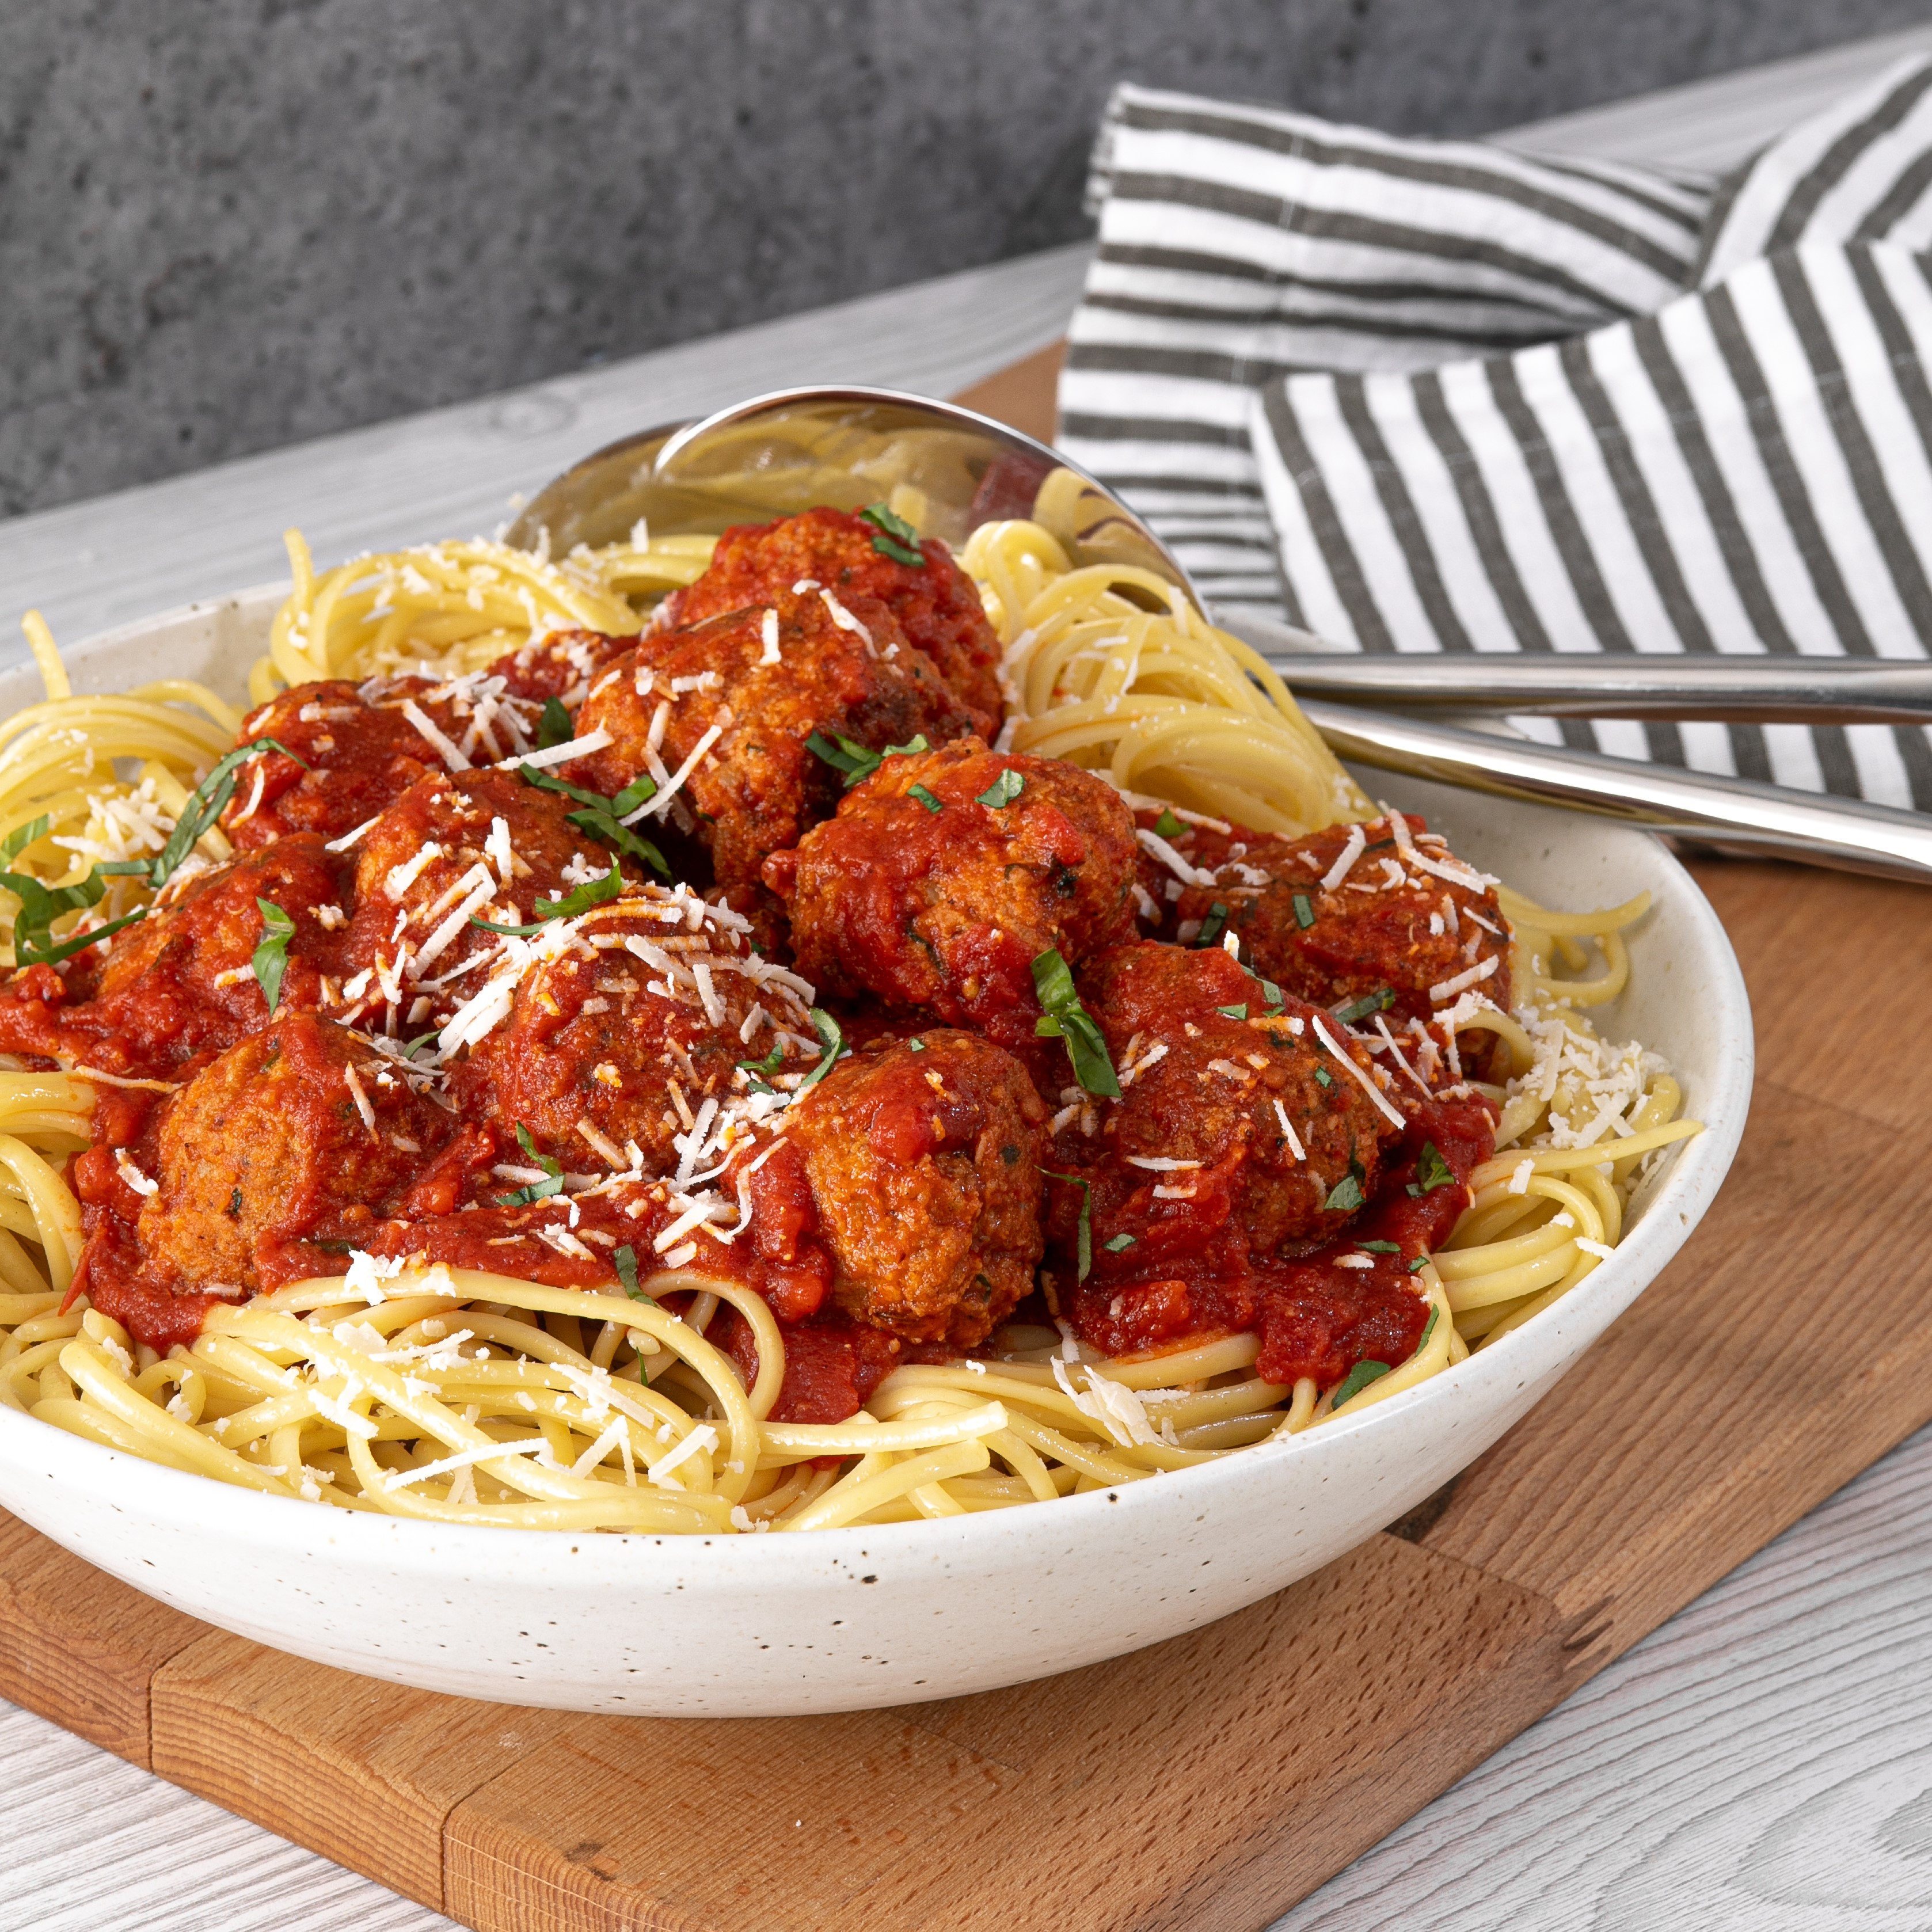 Linguine Marinara with Turkey Meatballs